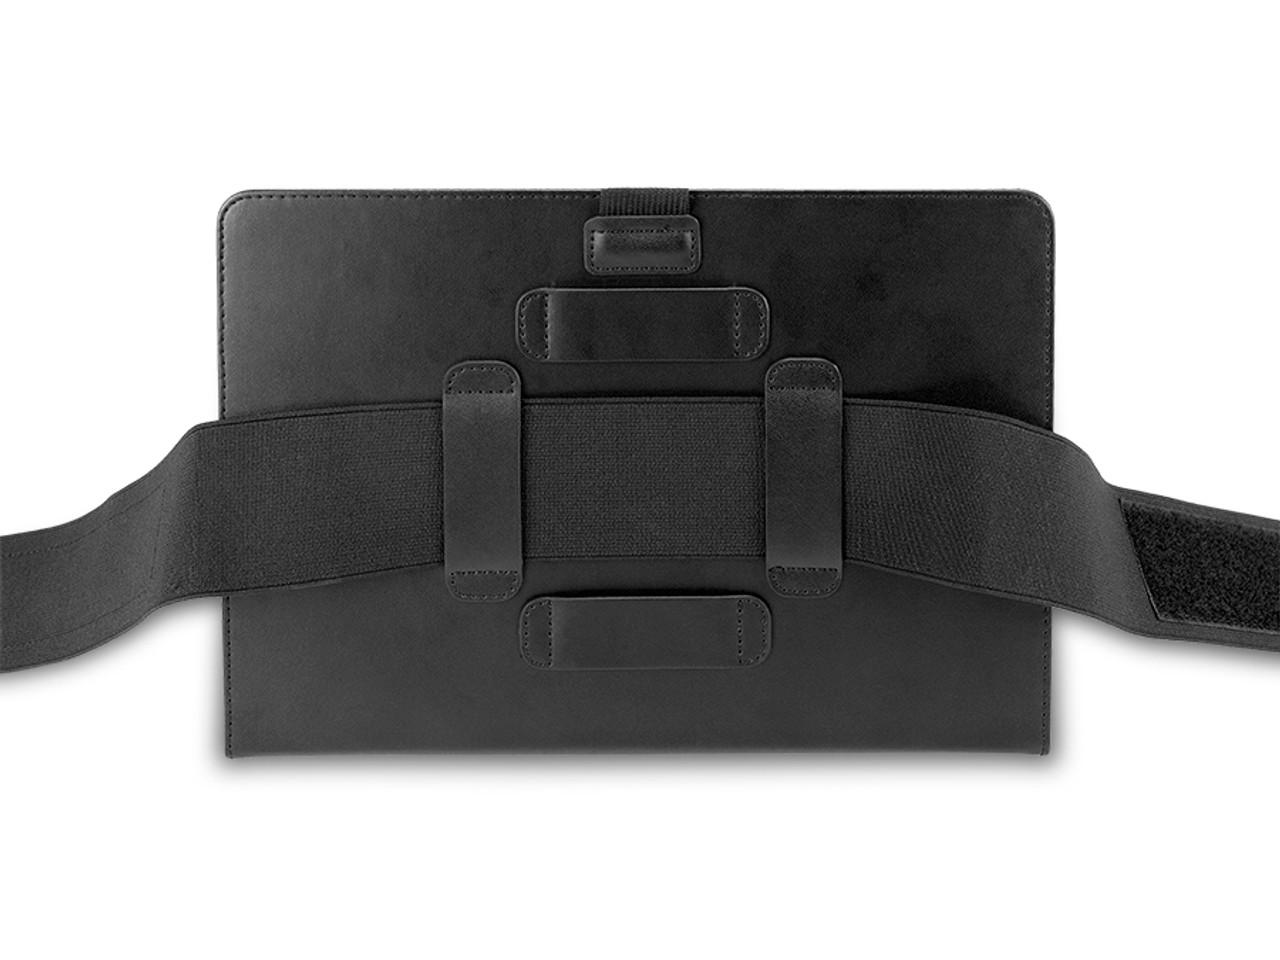 ASA iPad Air Rotating Kneeboard